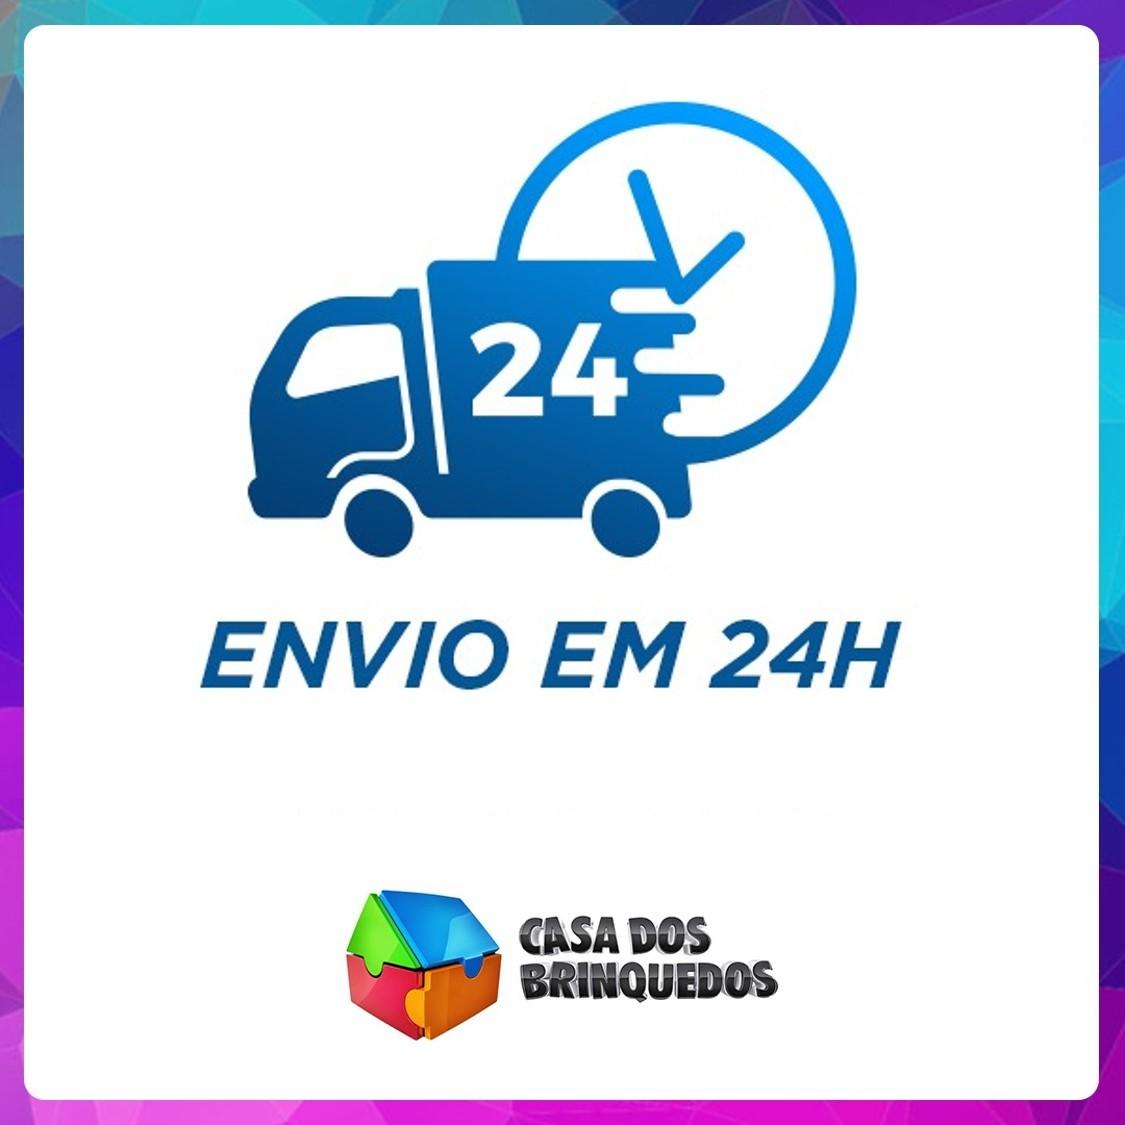 FOGÃO MINI CHEF ROSA COM ÁGUA 0317 TA TE TI